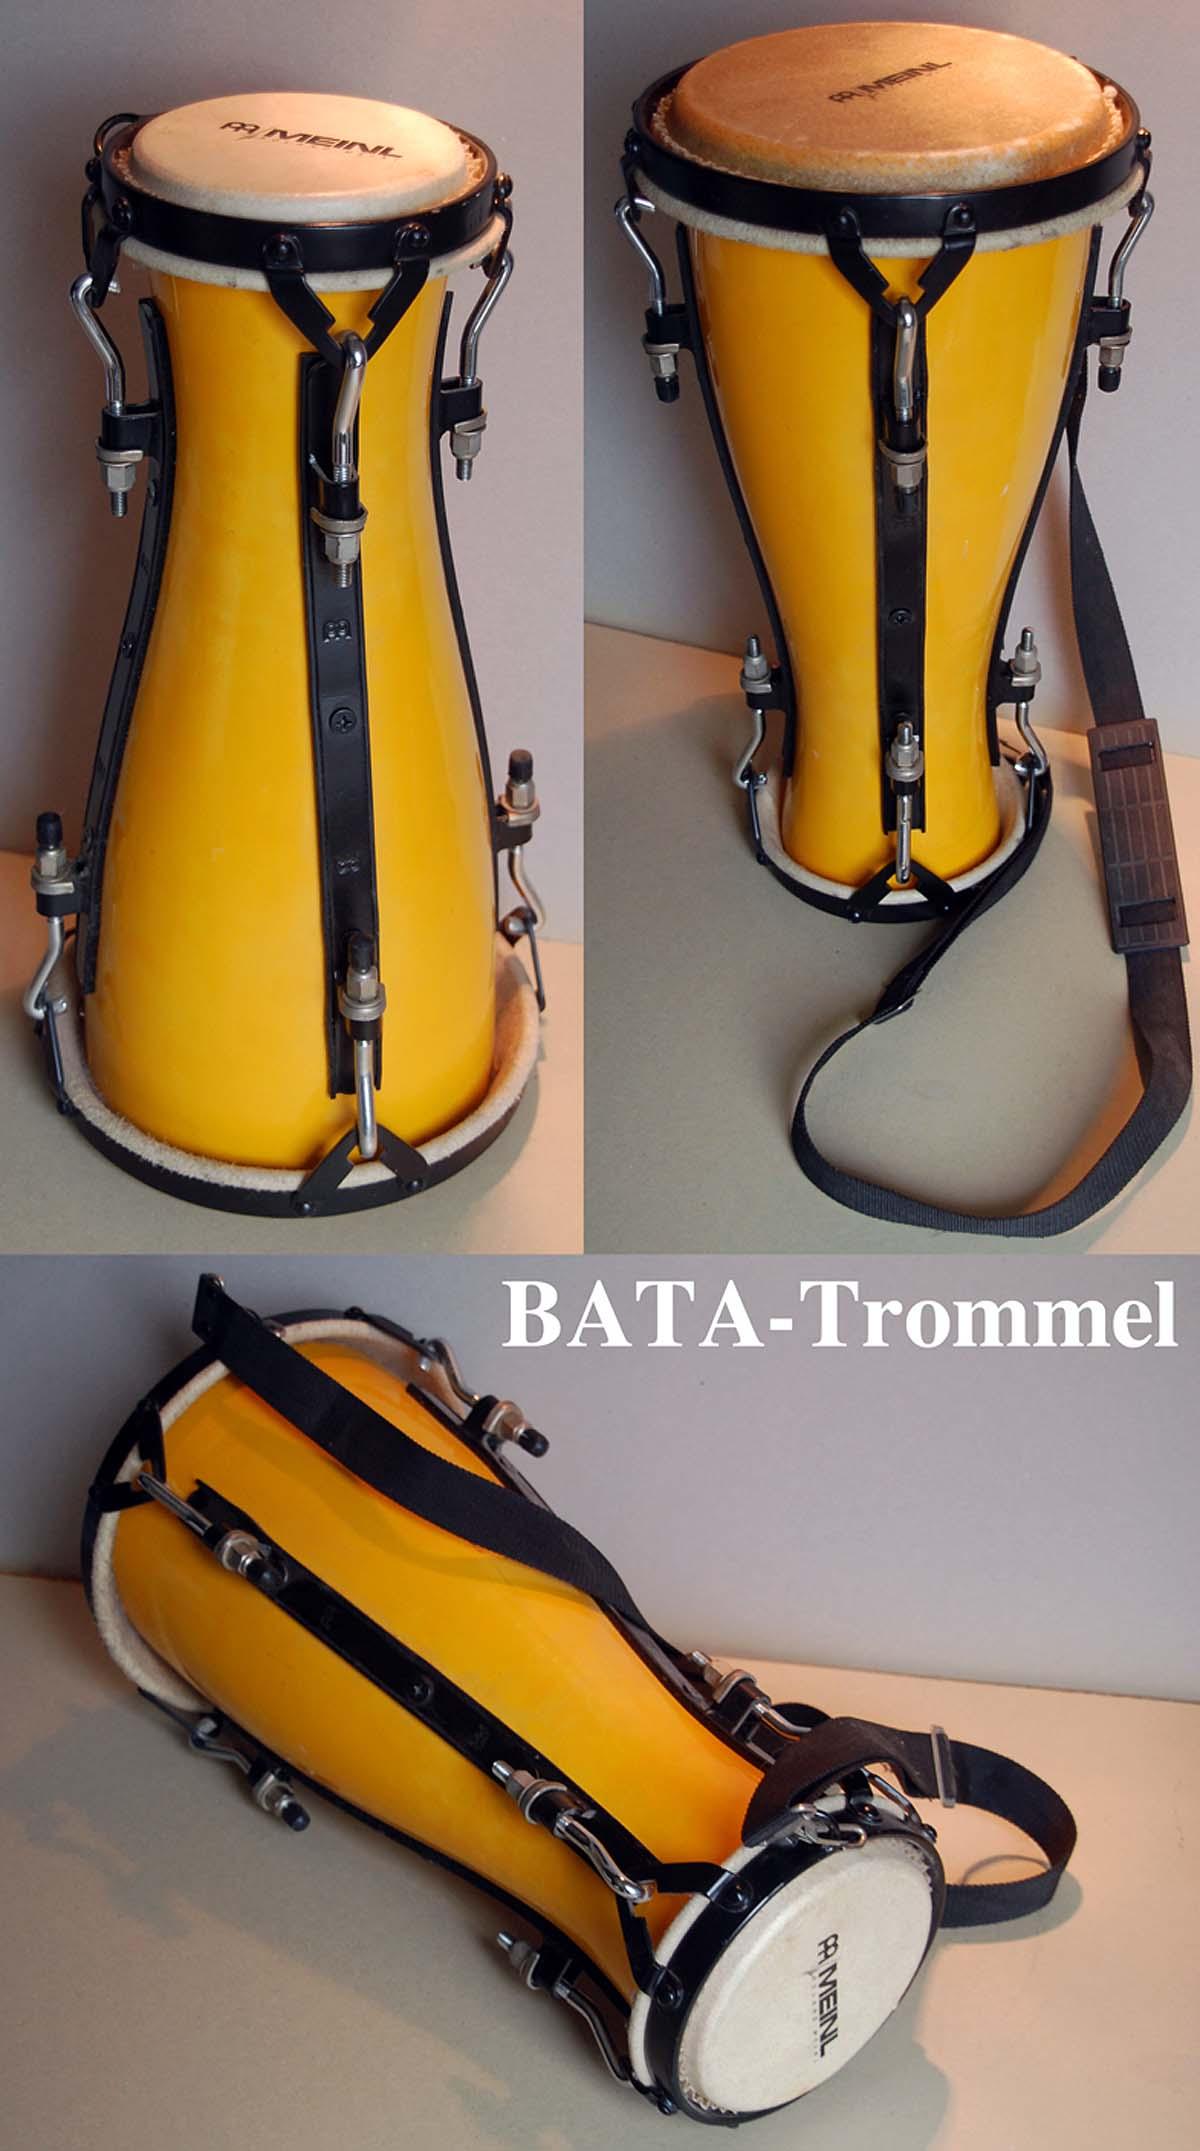 2-BATA-Trommel